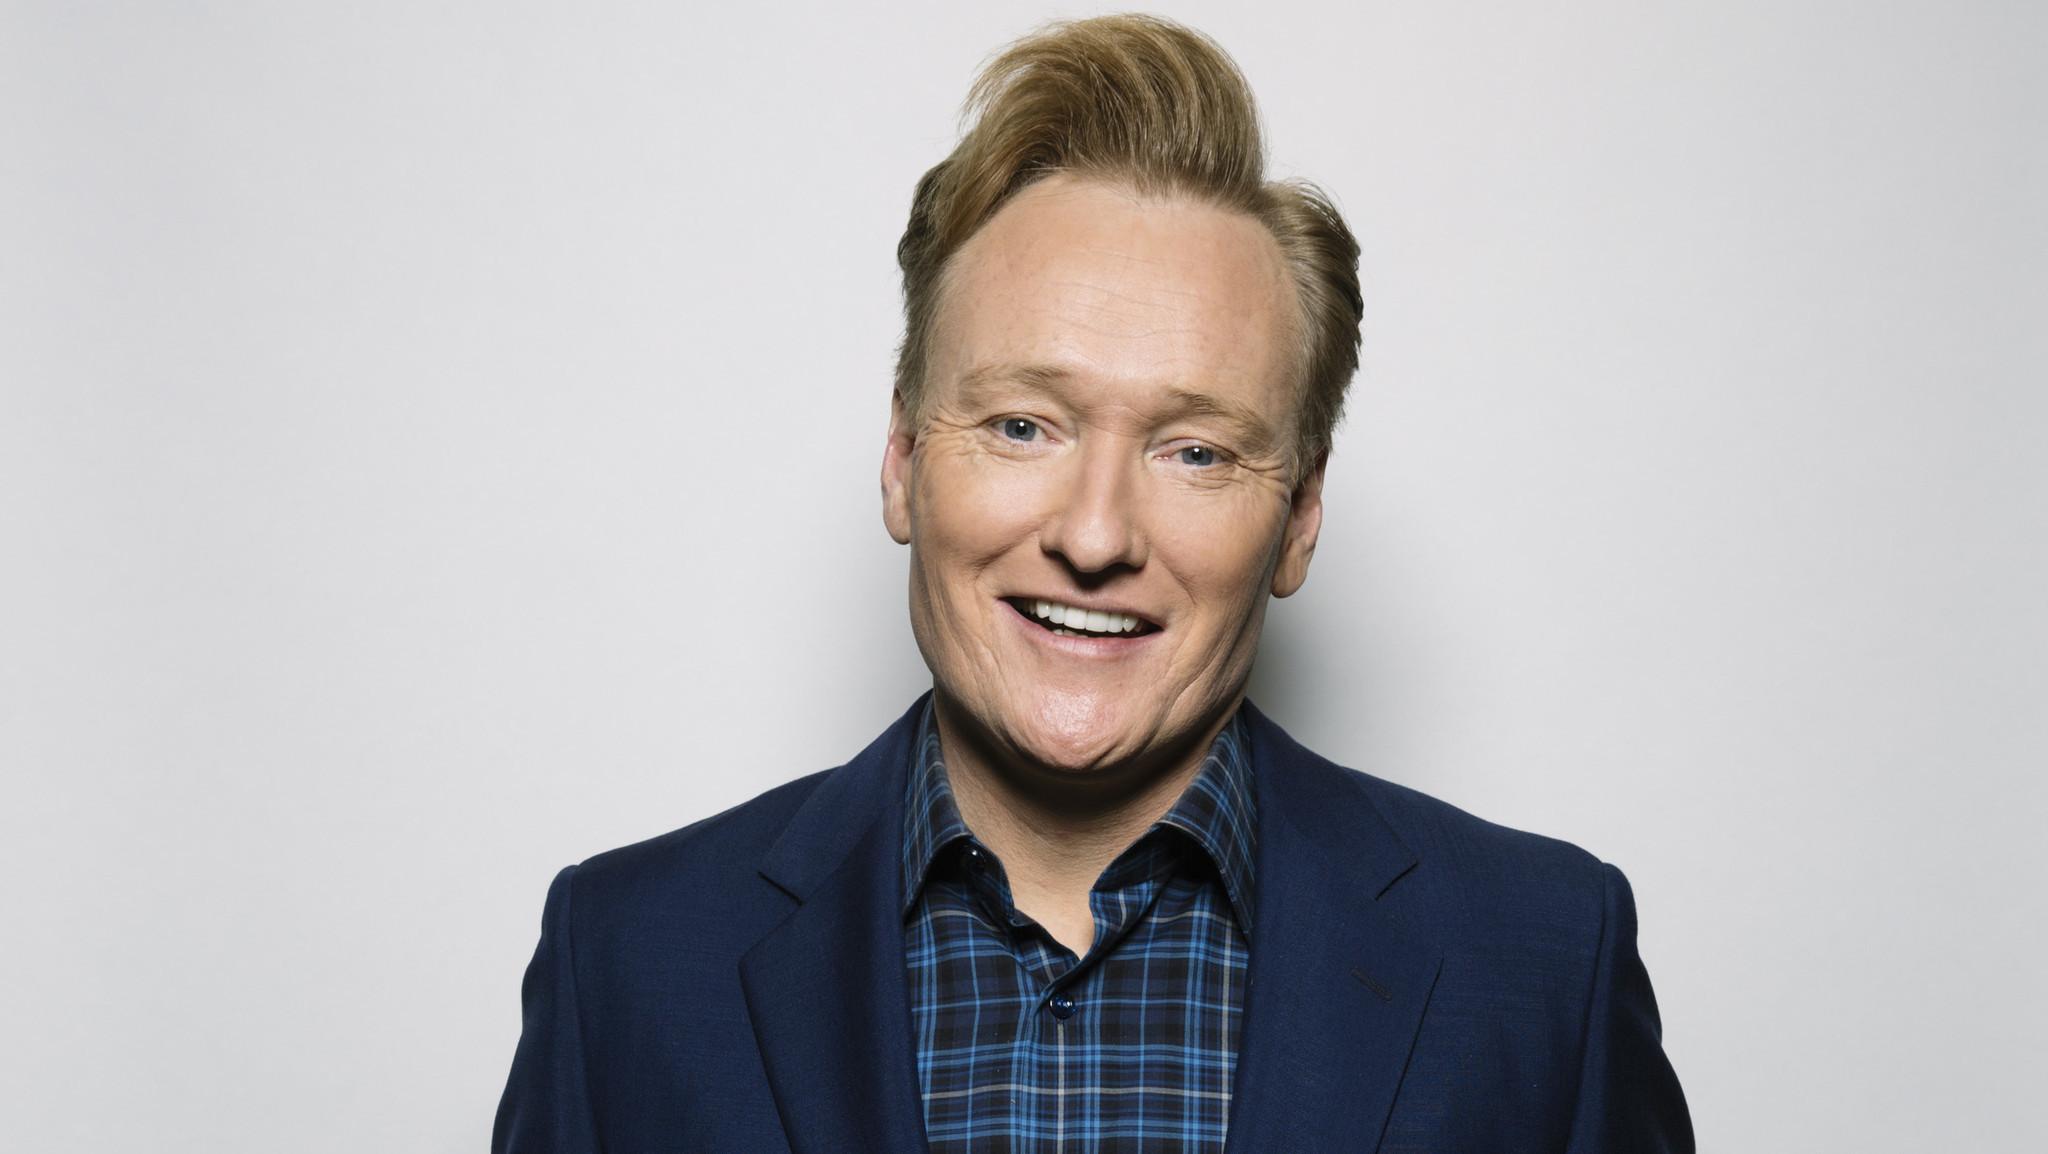 Conan O'Brien Wants Your Mexico-Themed Fan Art for His Mexico City Episode